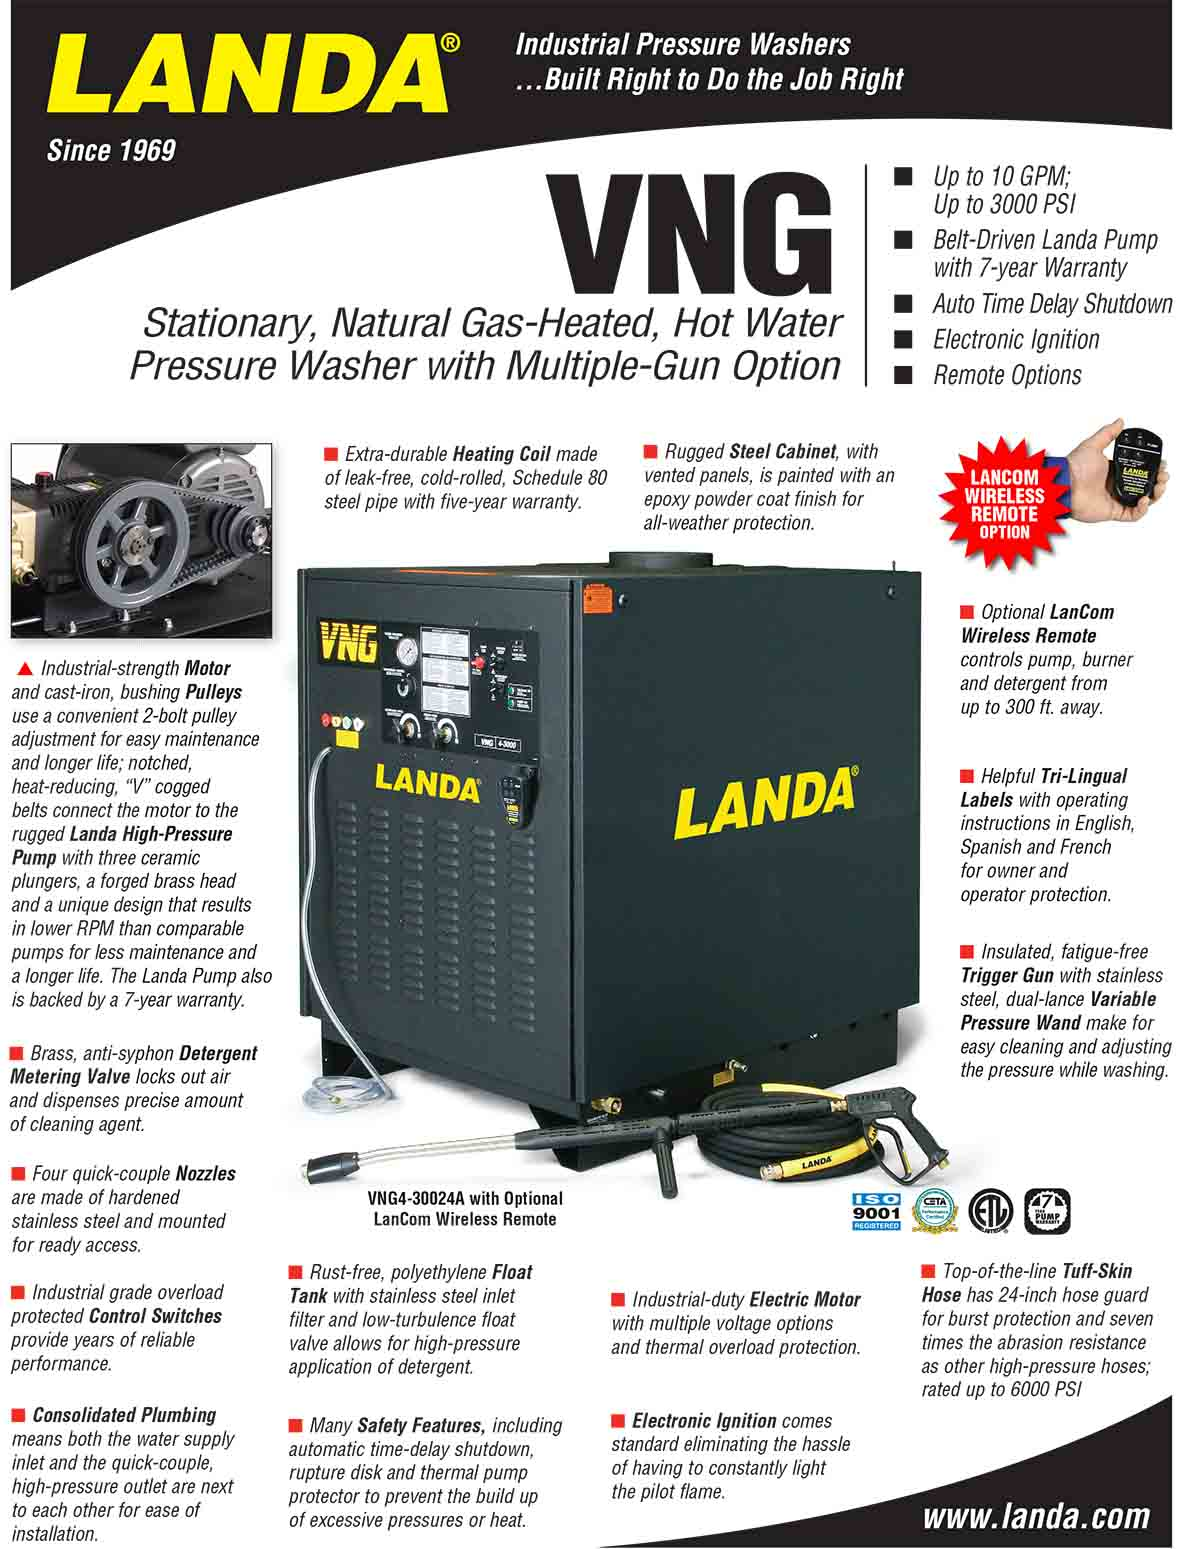 LANDA VNG Equipment Flyer